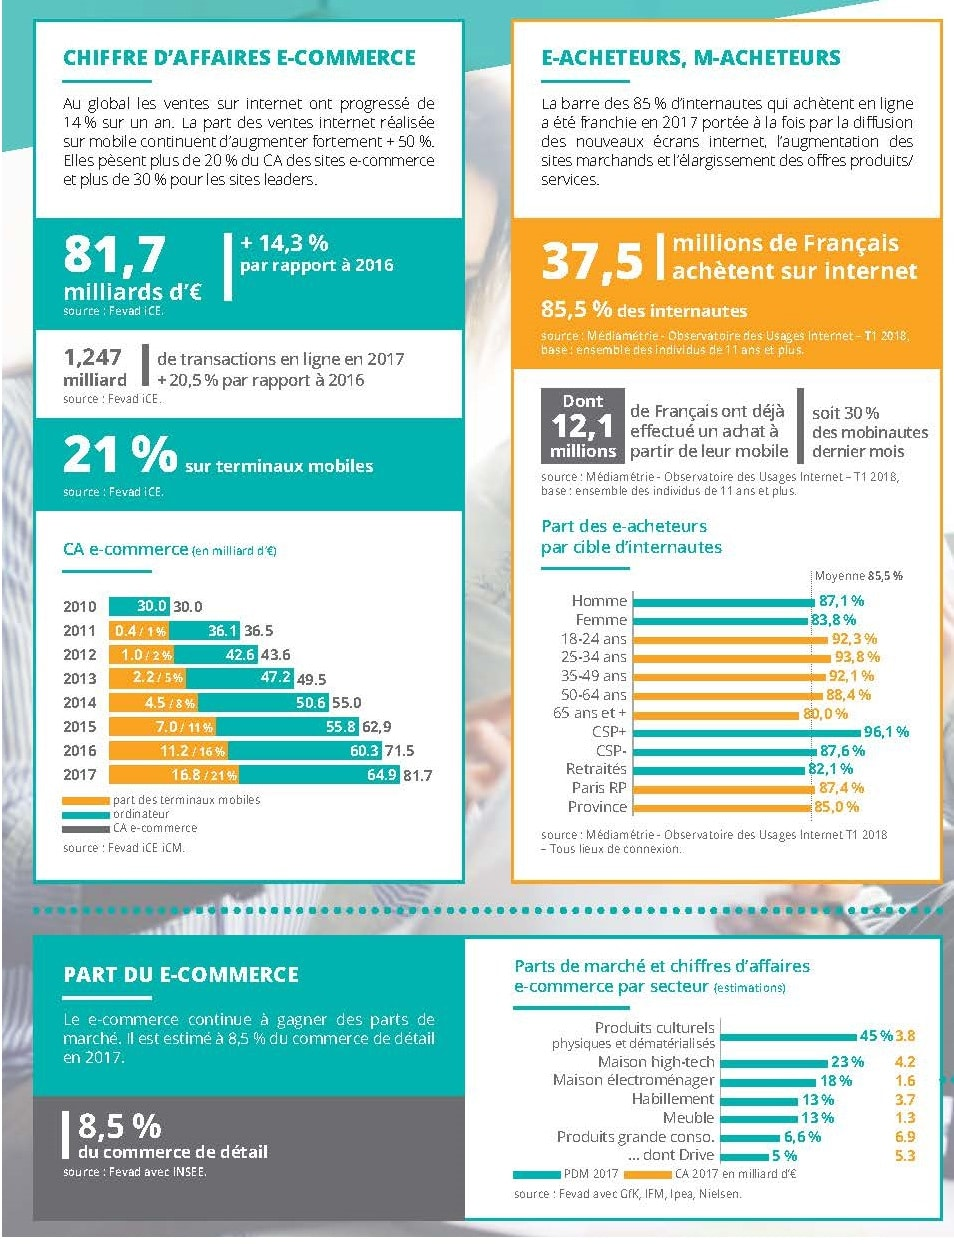 Chiffres clés du e-commerce en France selon la FEVAD